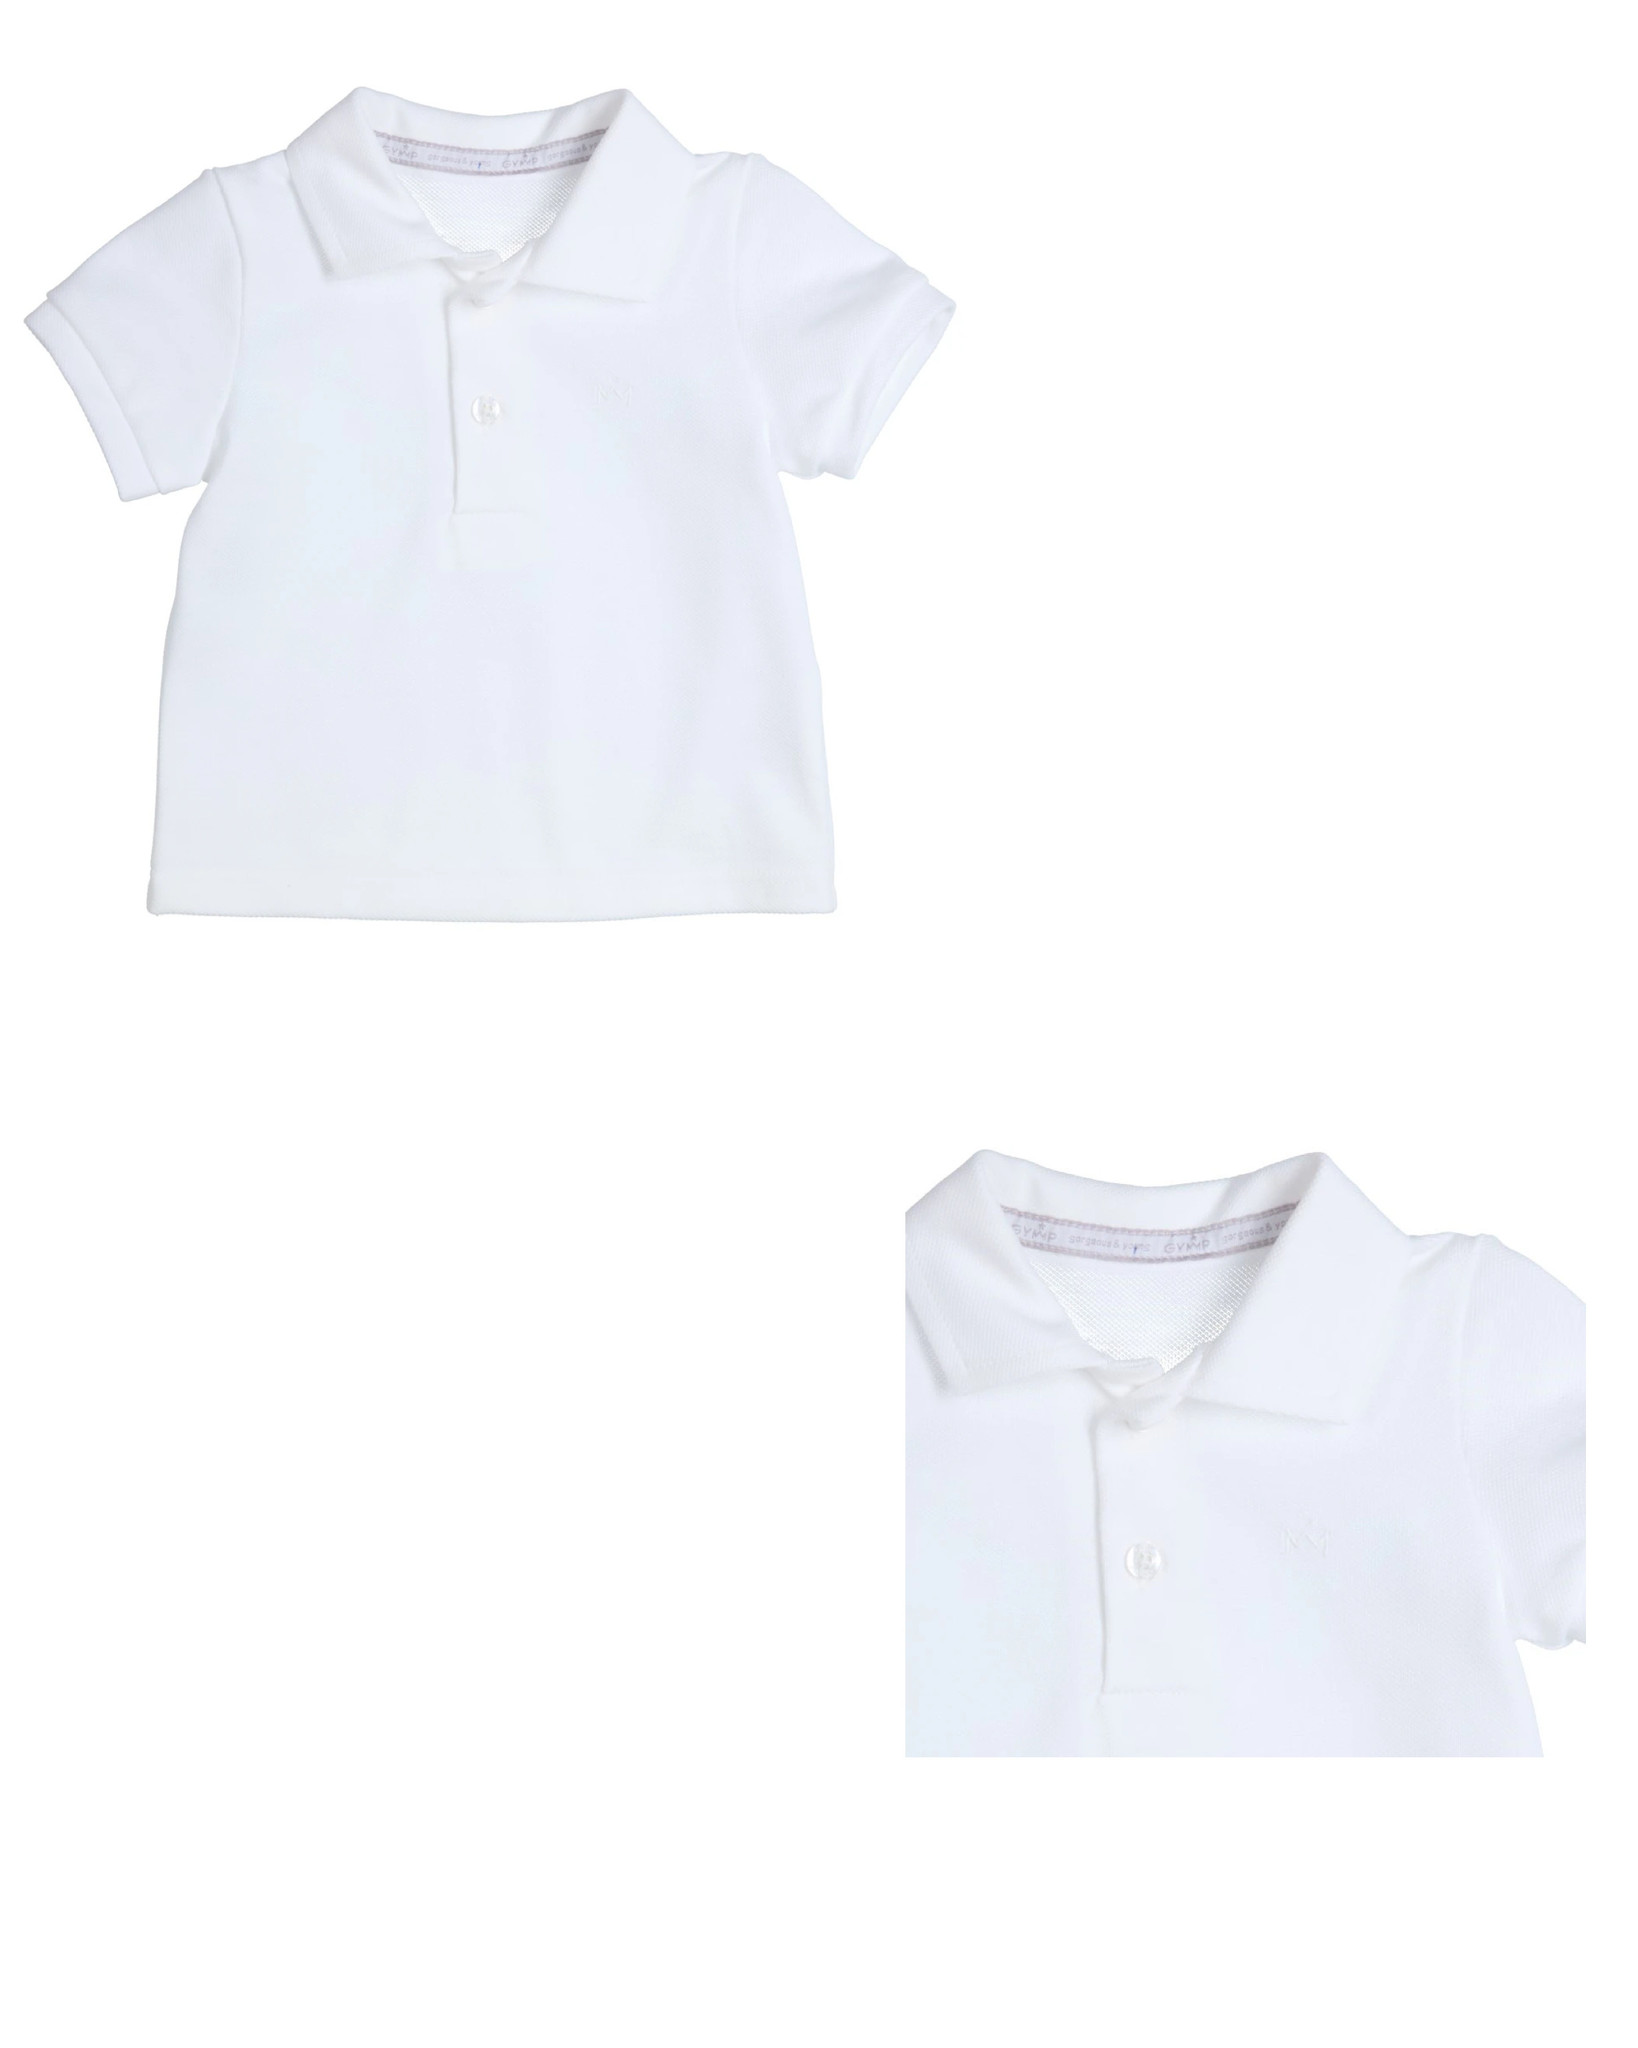 Gymp Gymp White Polo Shirt 1105 S21